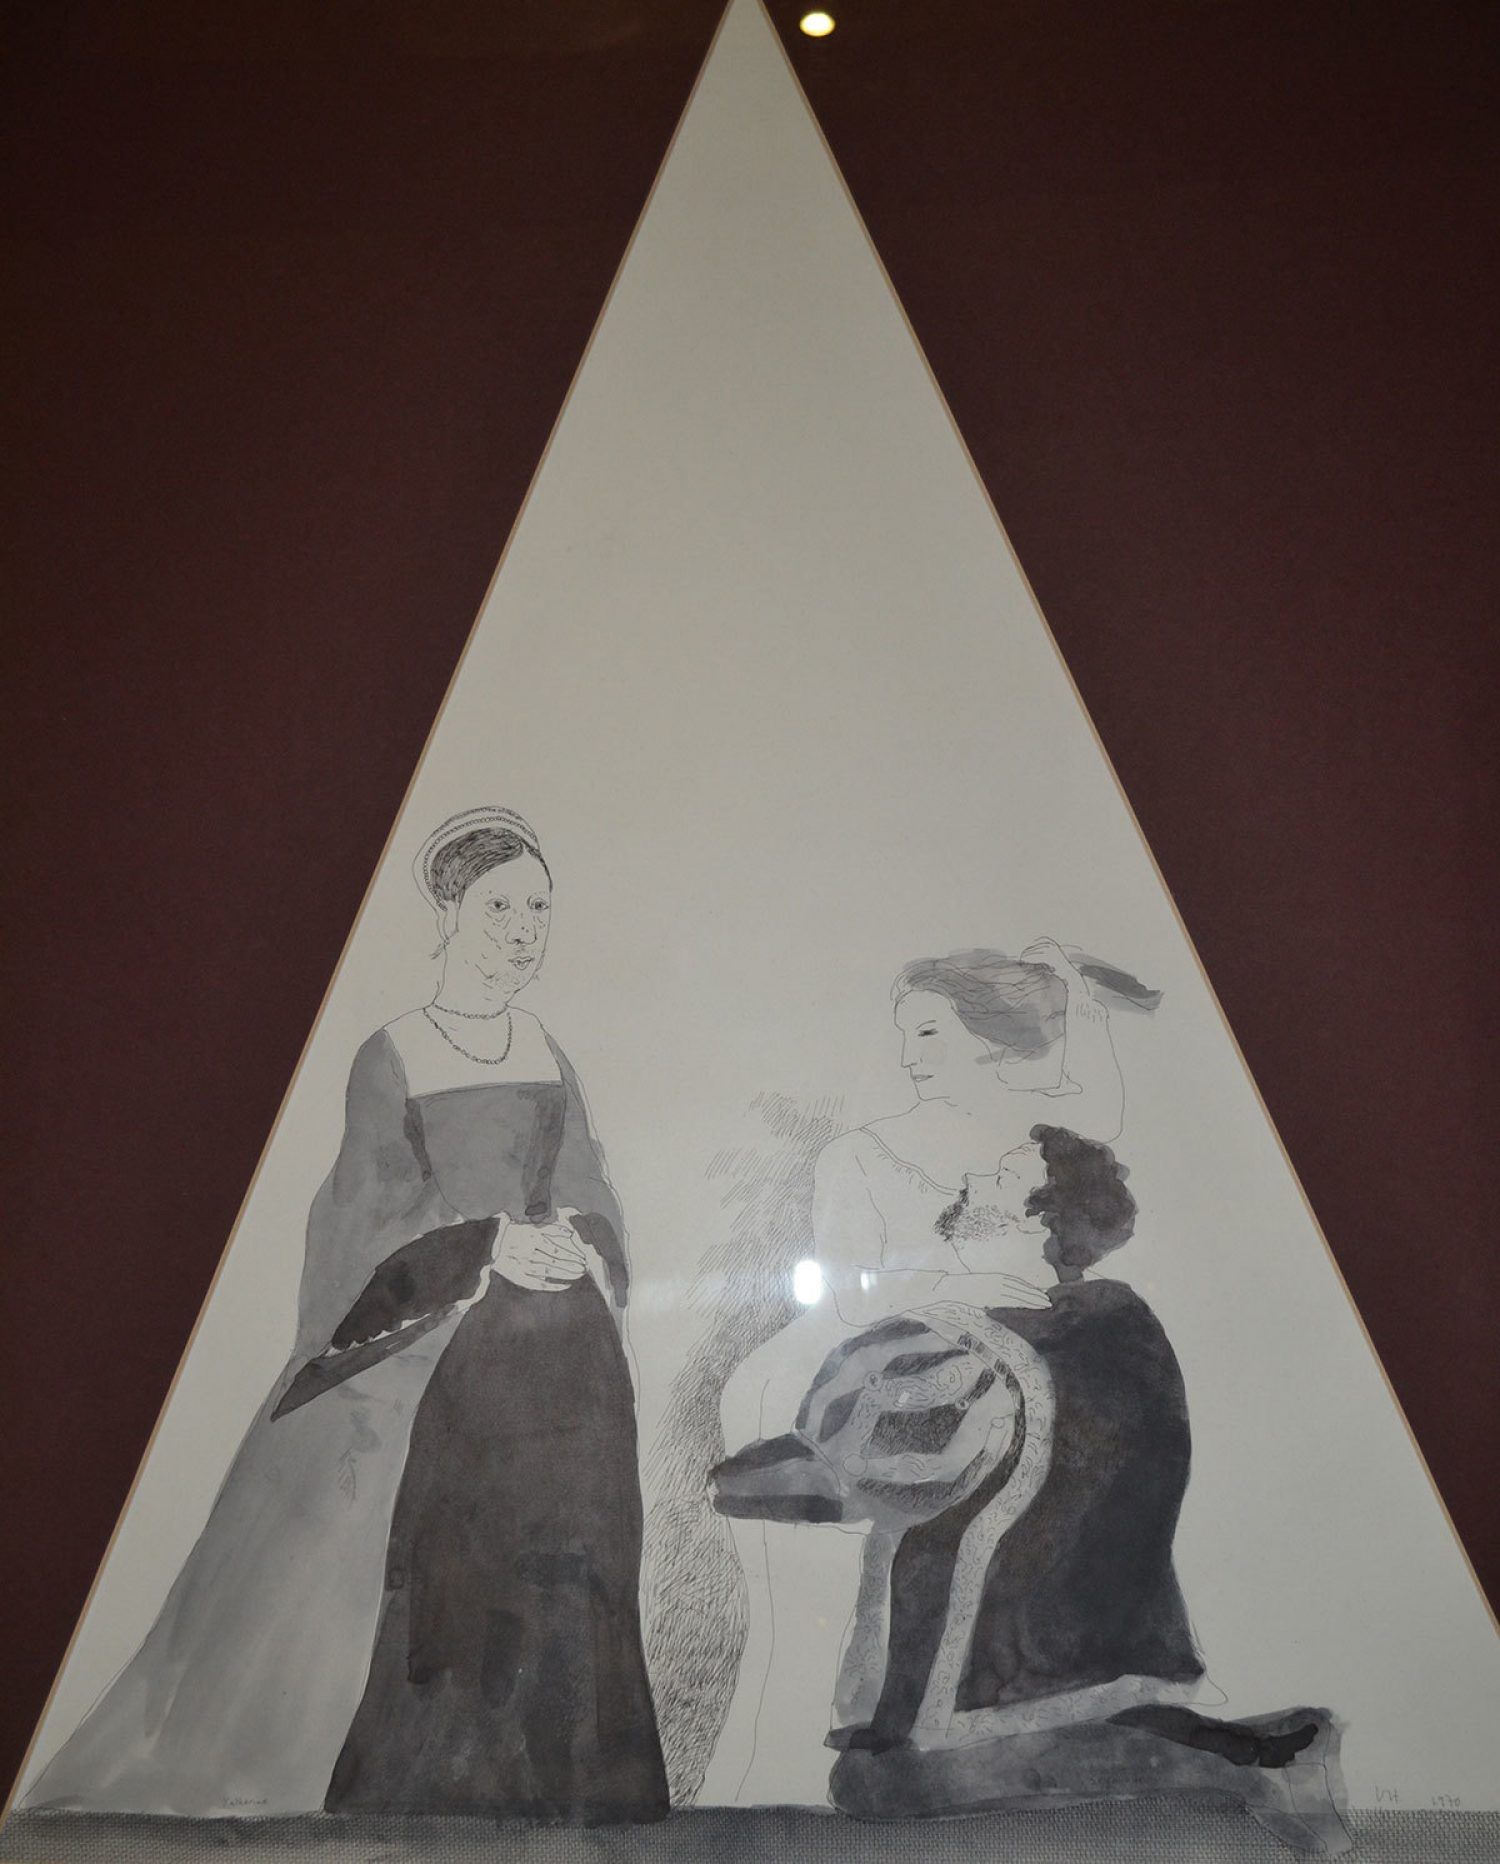 Illustration depicting love triangle of Katherine Parr